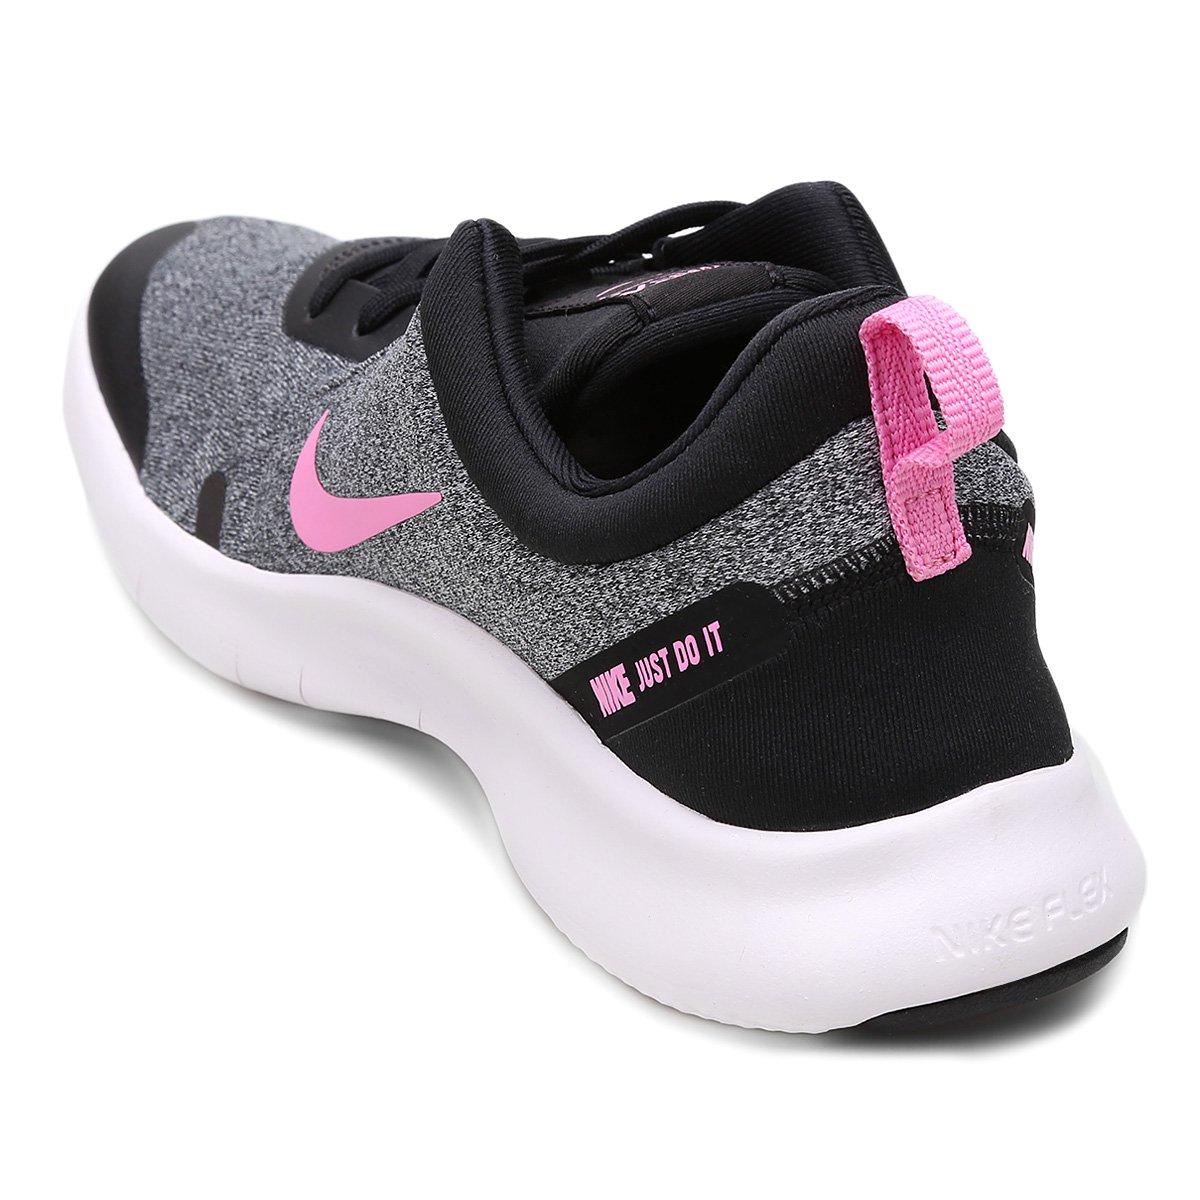 6ec4fbb72b189 ... Foto 2 - Tênis Nike WmnsFlex Experience Rn 8 Feminino